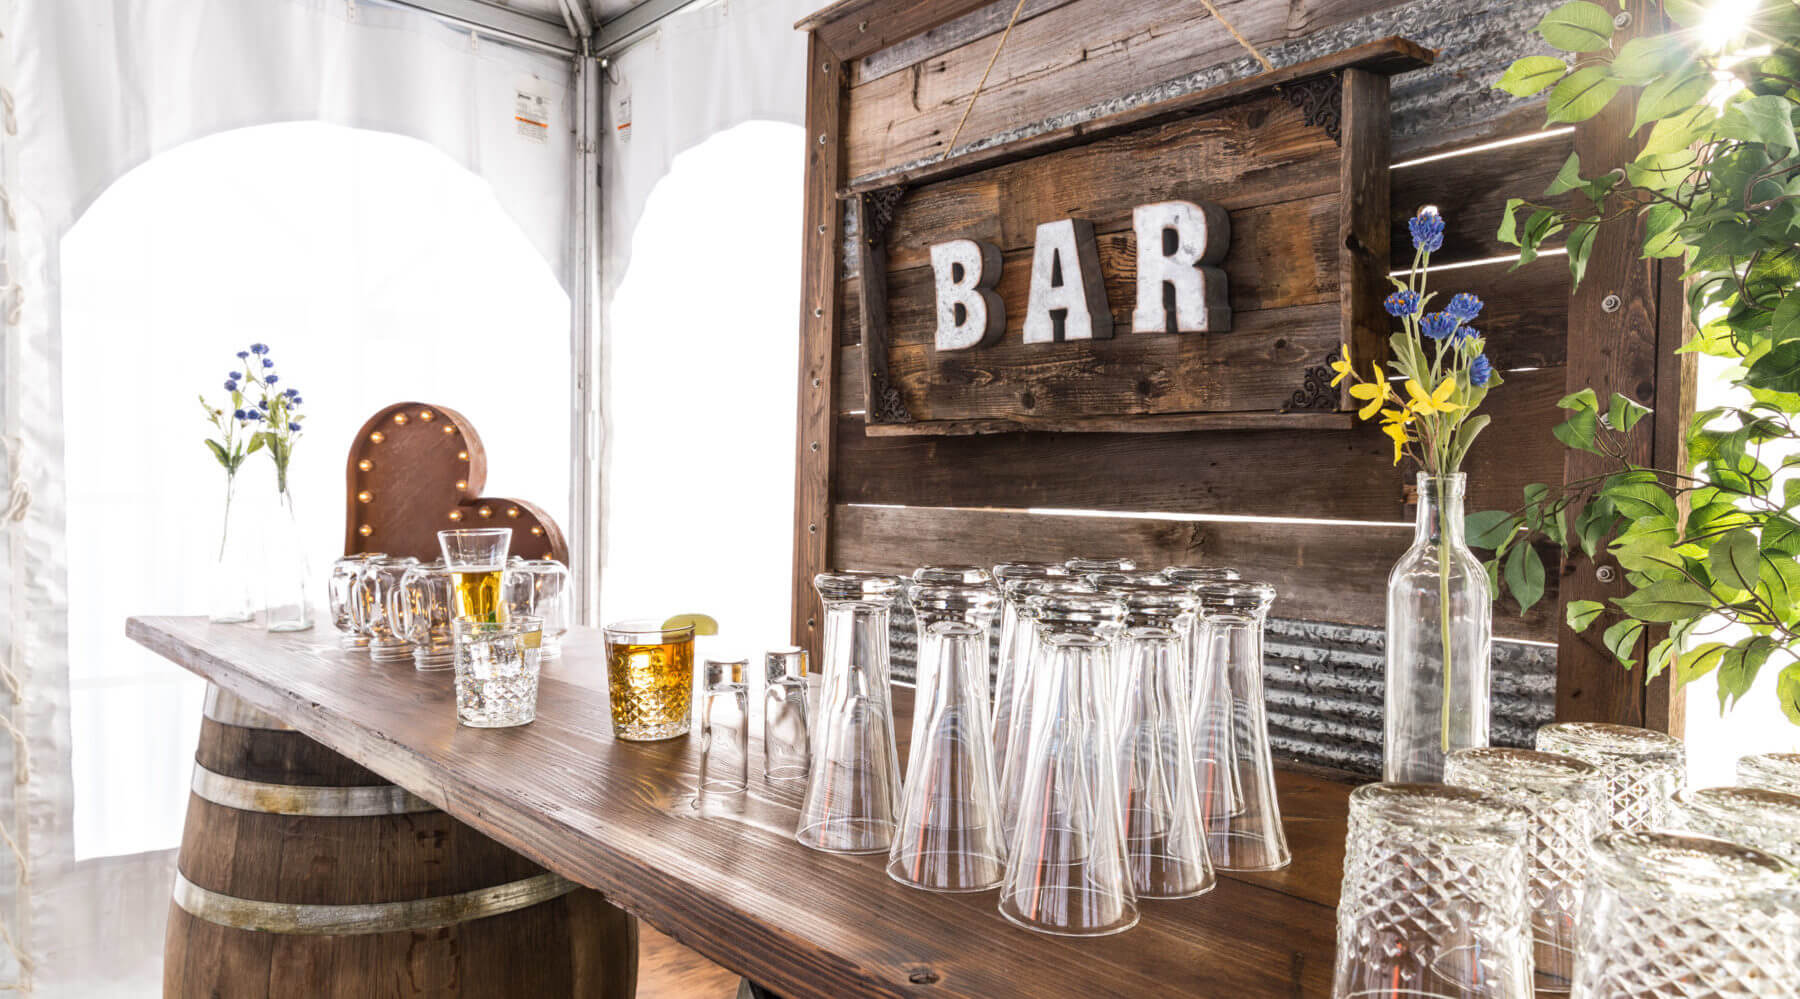 Whiskey Barrel Bar And Decor Wall